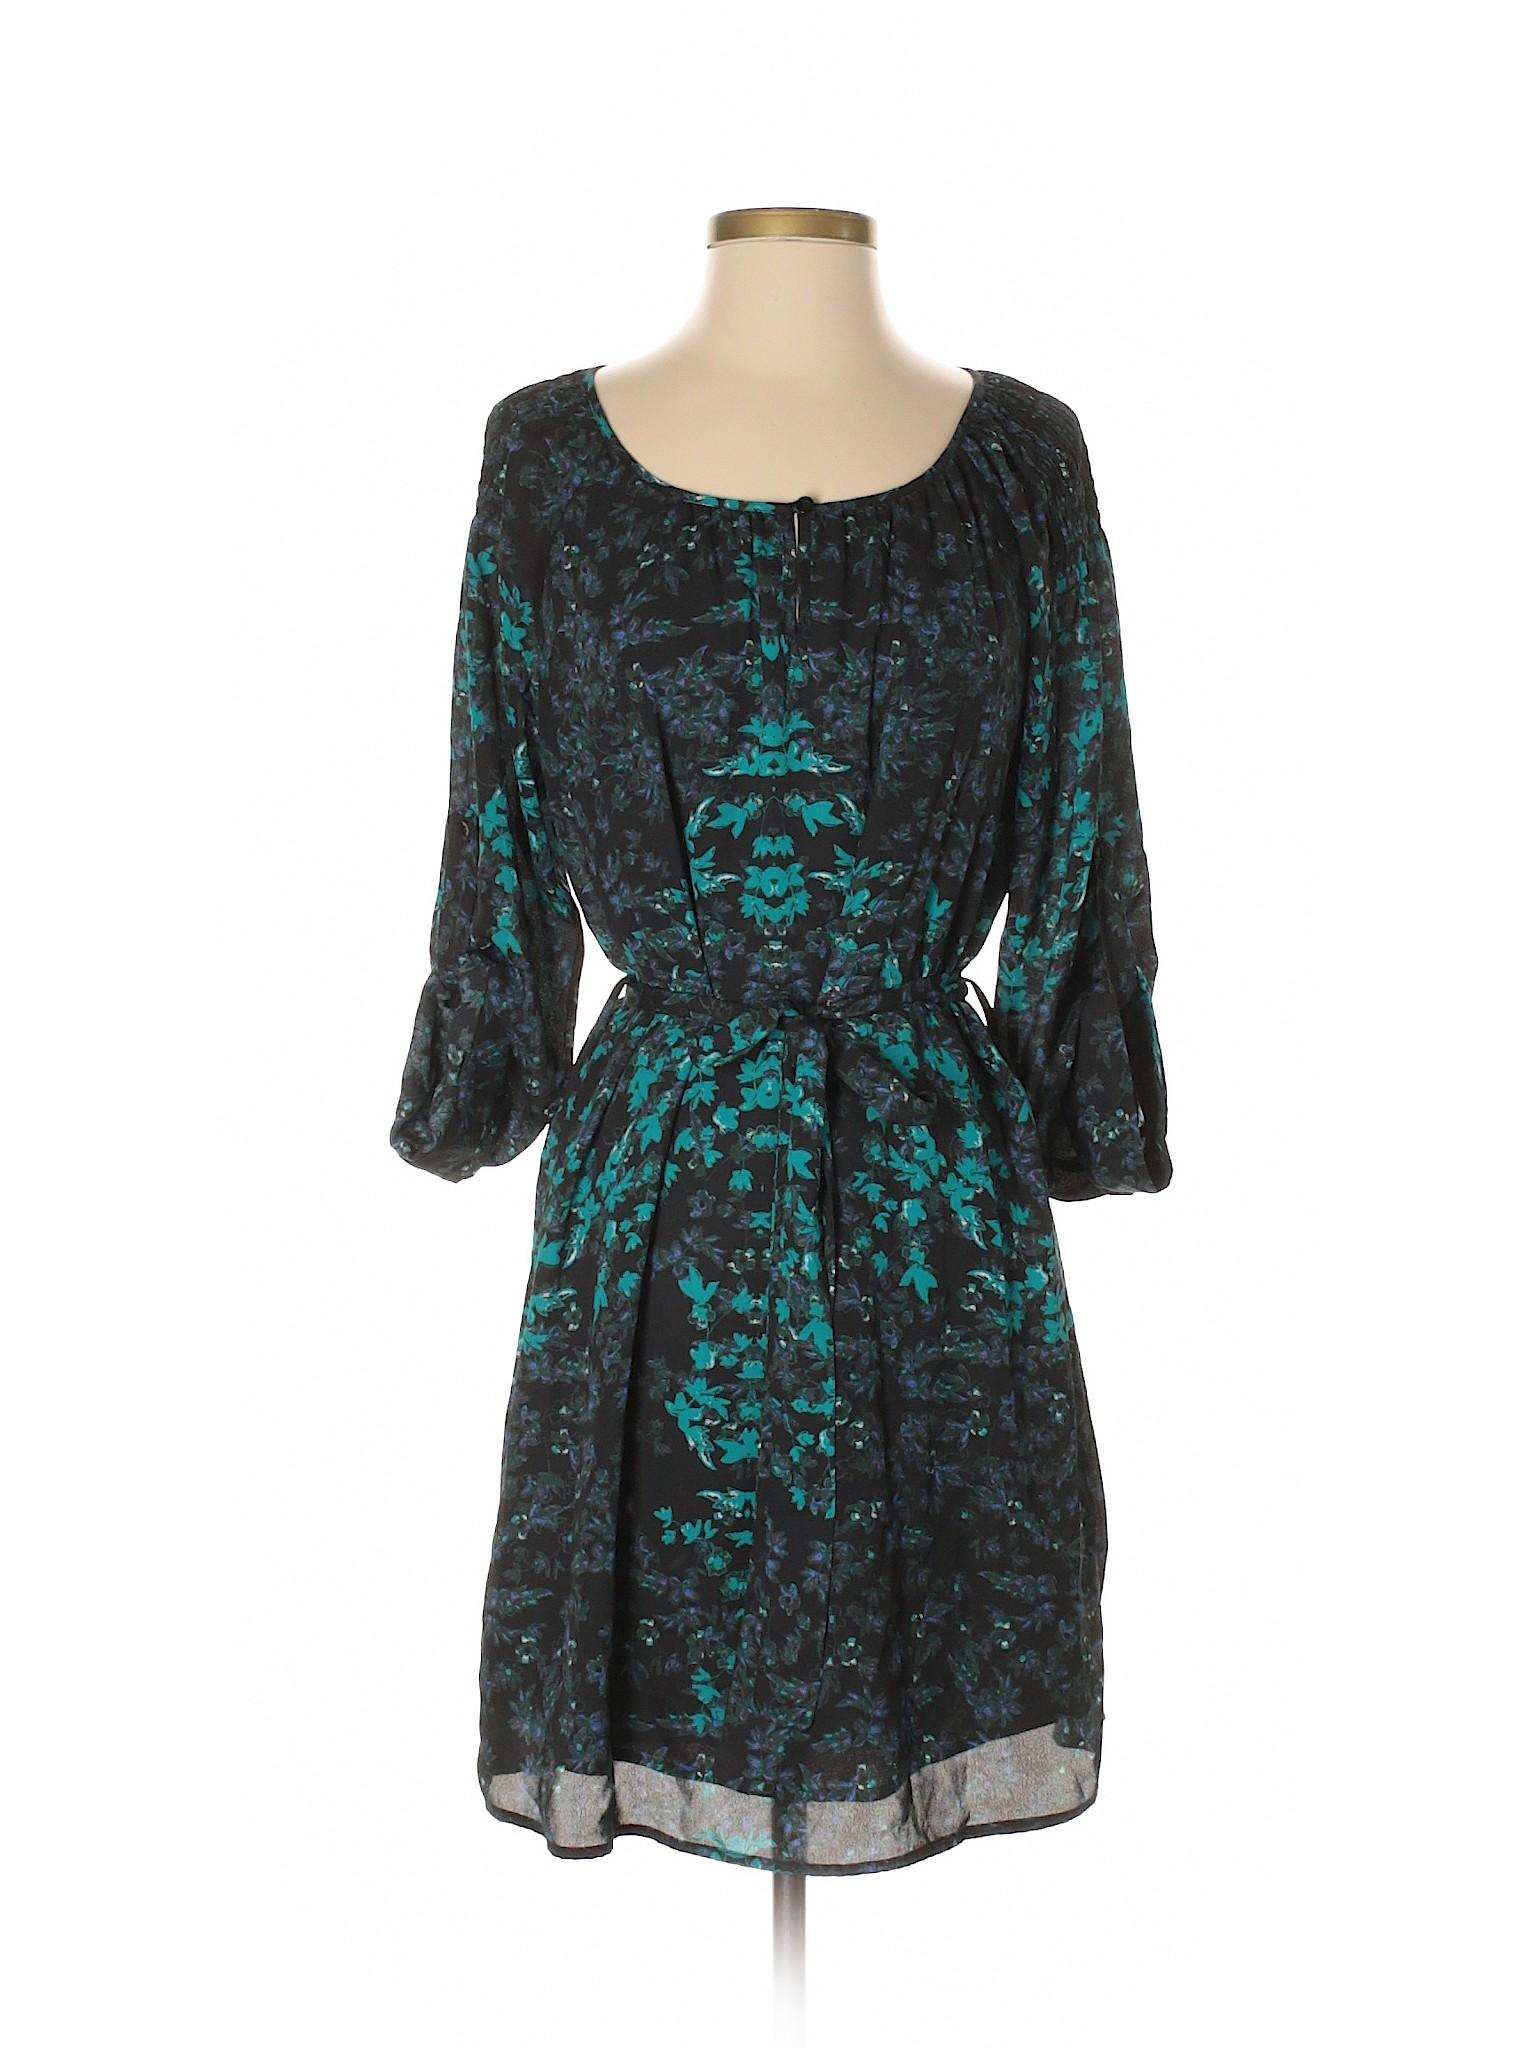 Dress Concepts Collective winter Boutique Casual IZq67pnwB